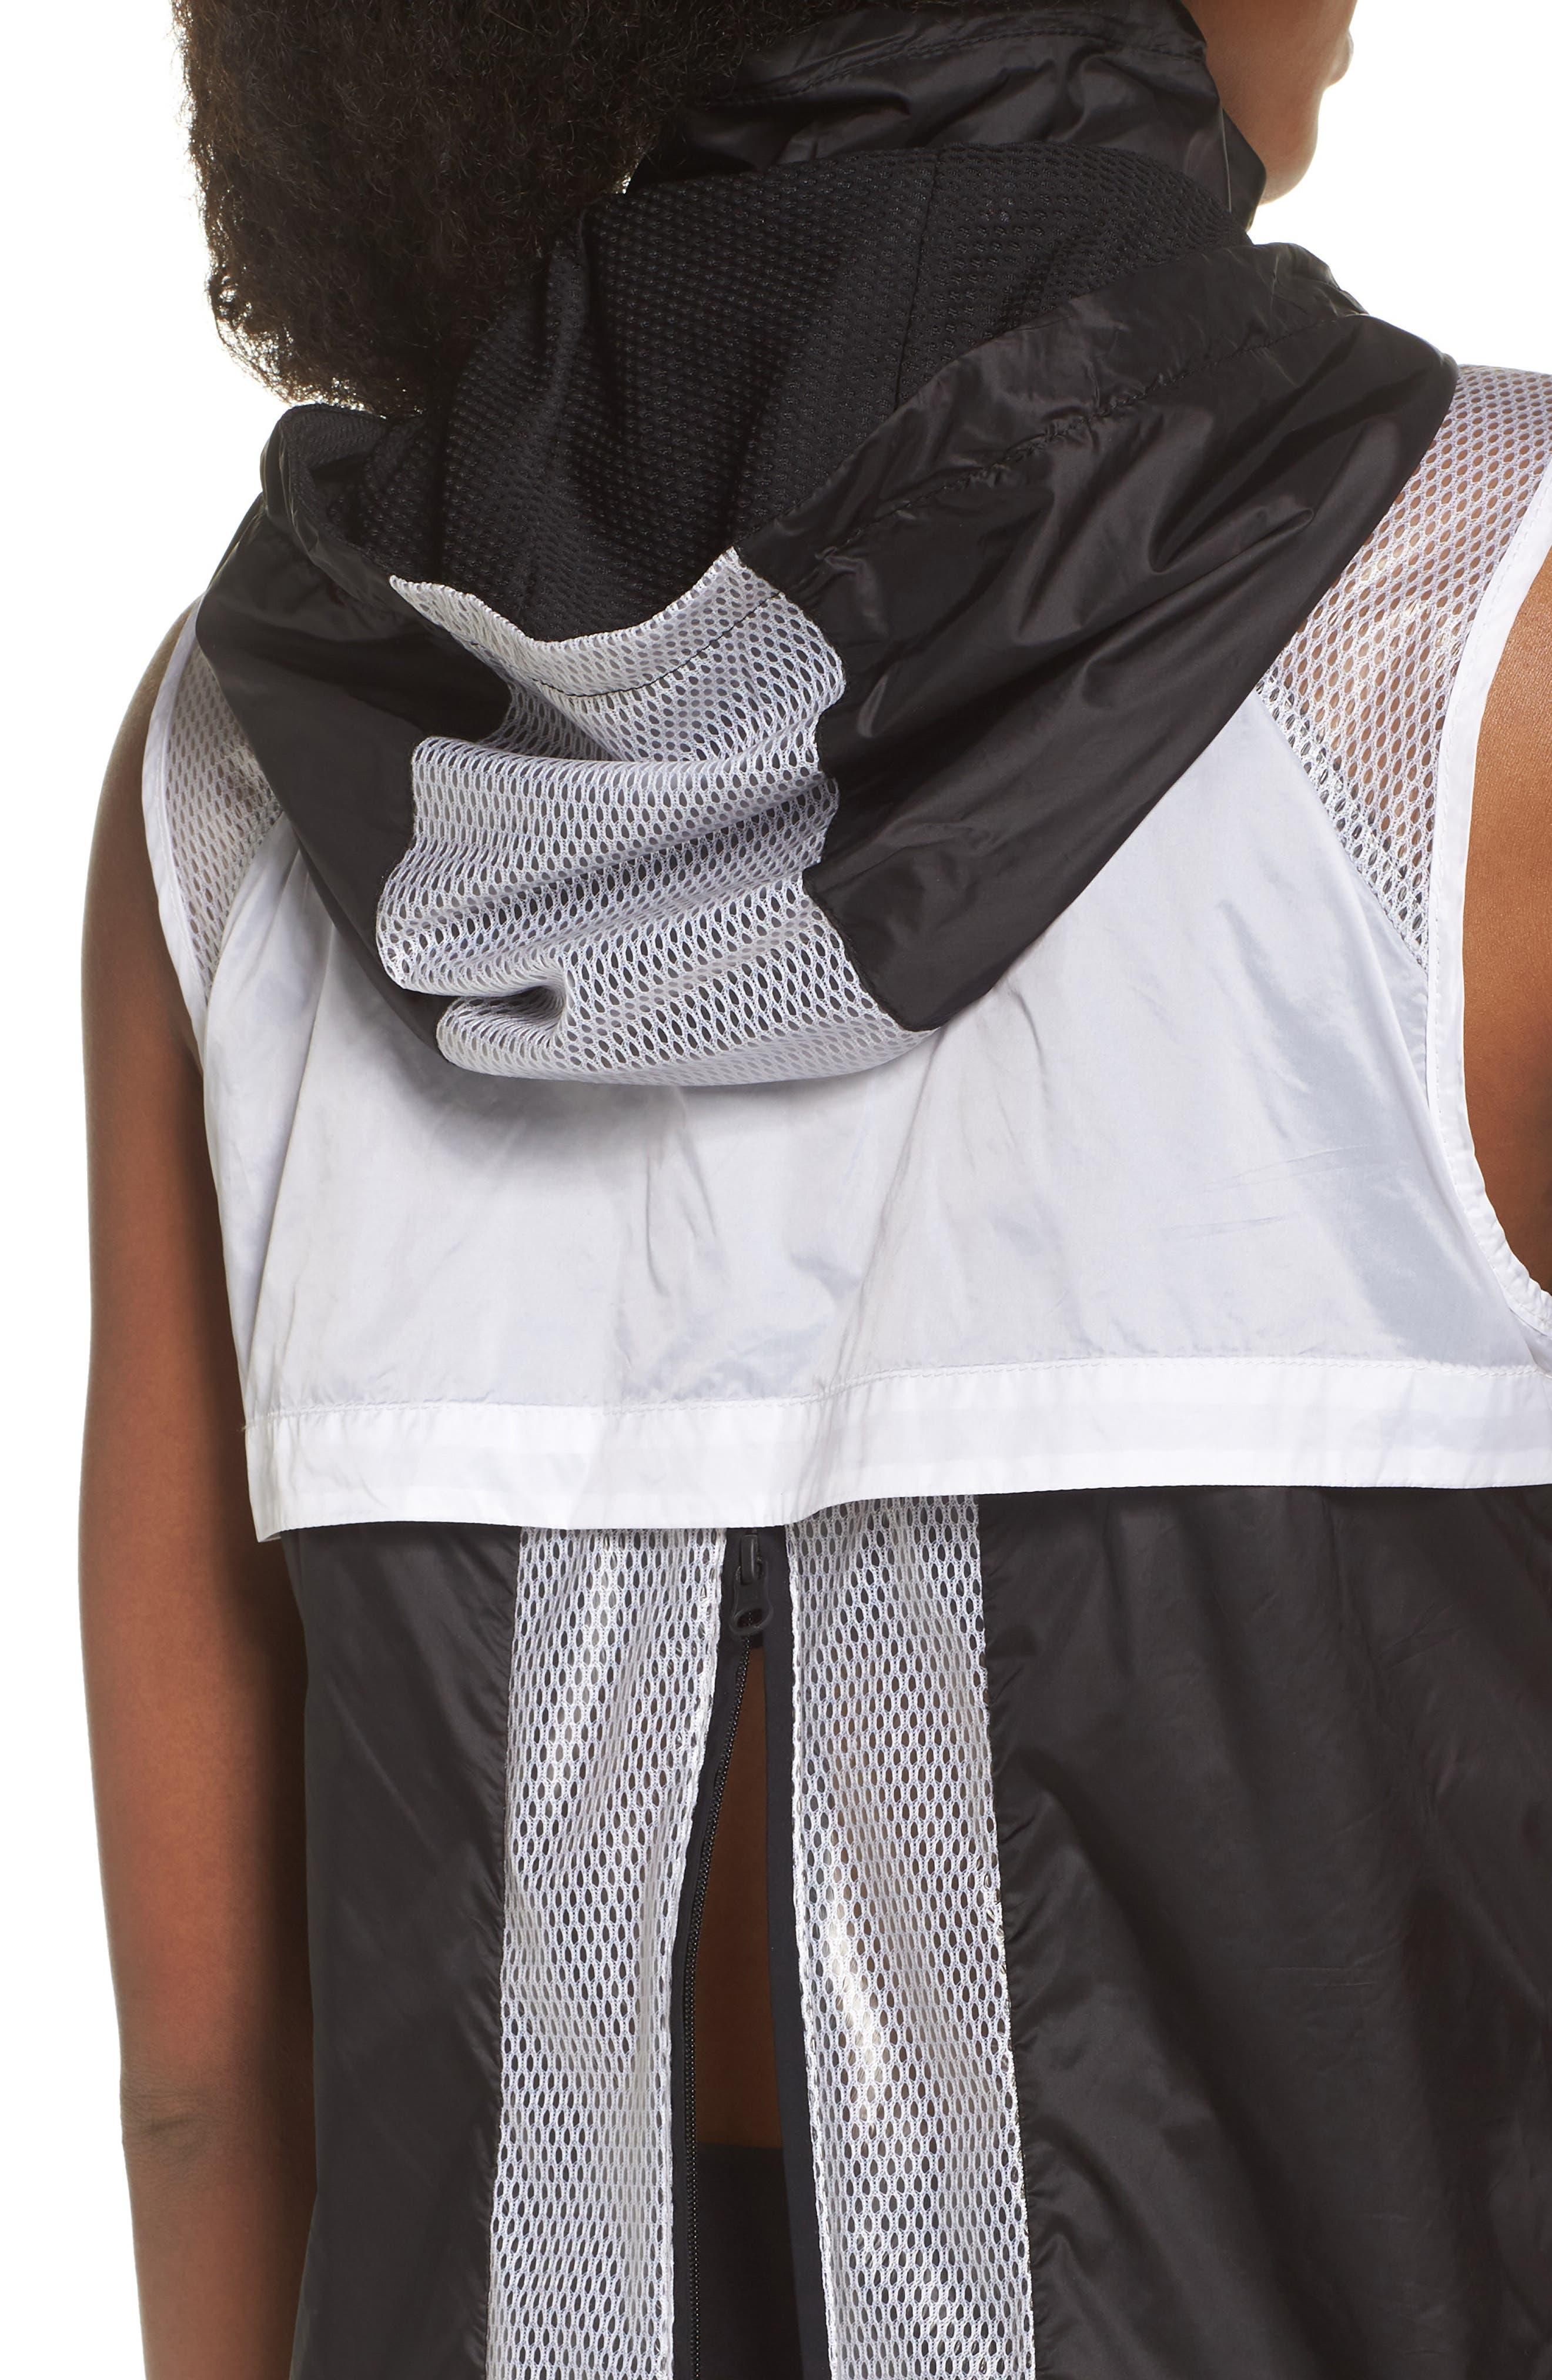 Moonlight Vest,                             Alternate thumbnail 4, color,                             Black